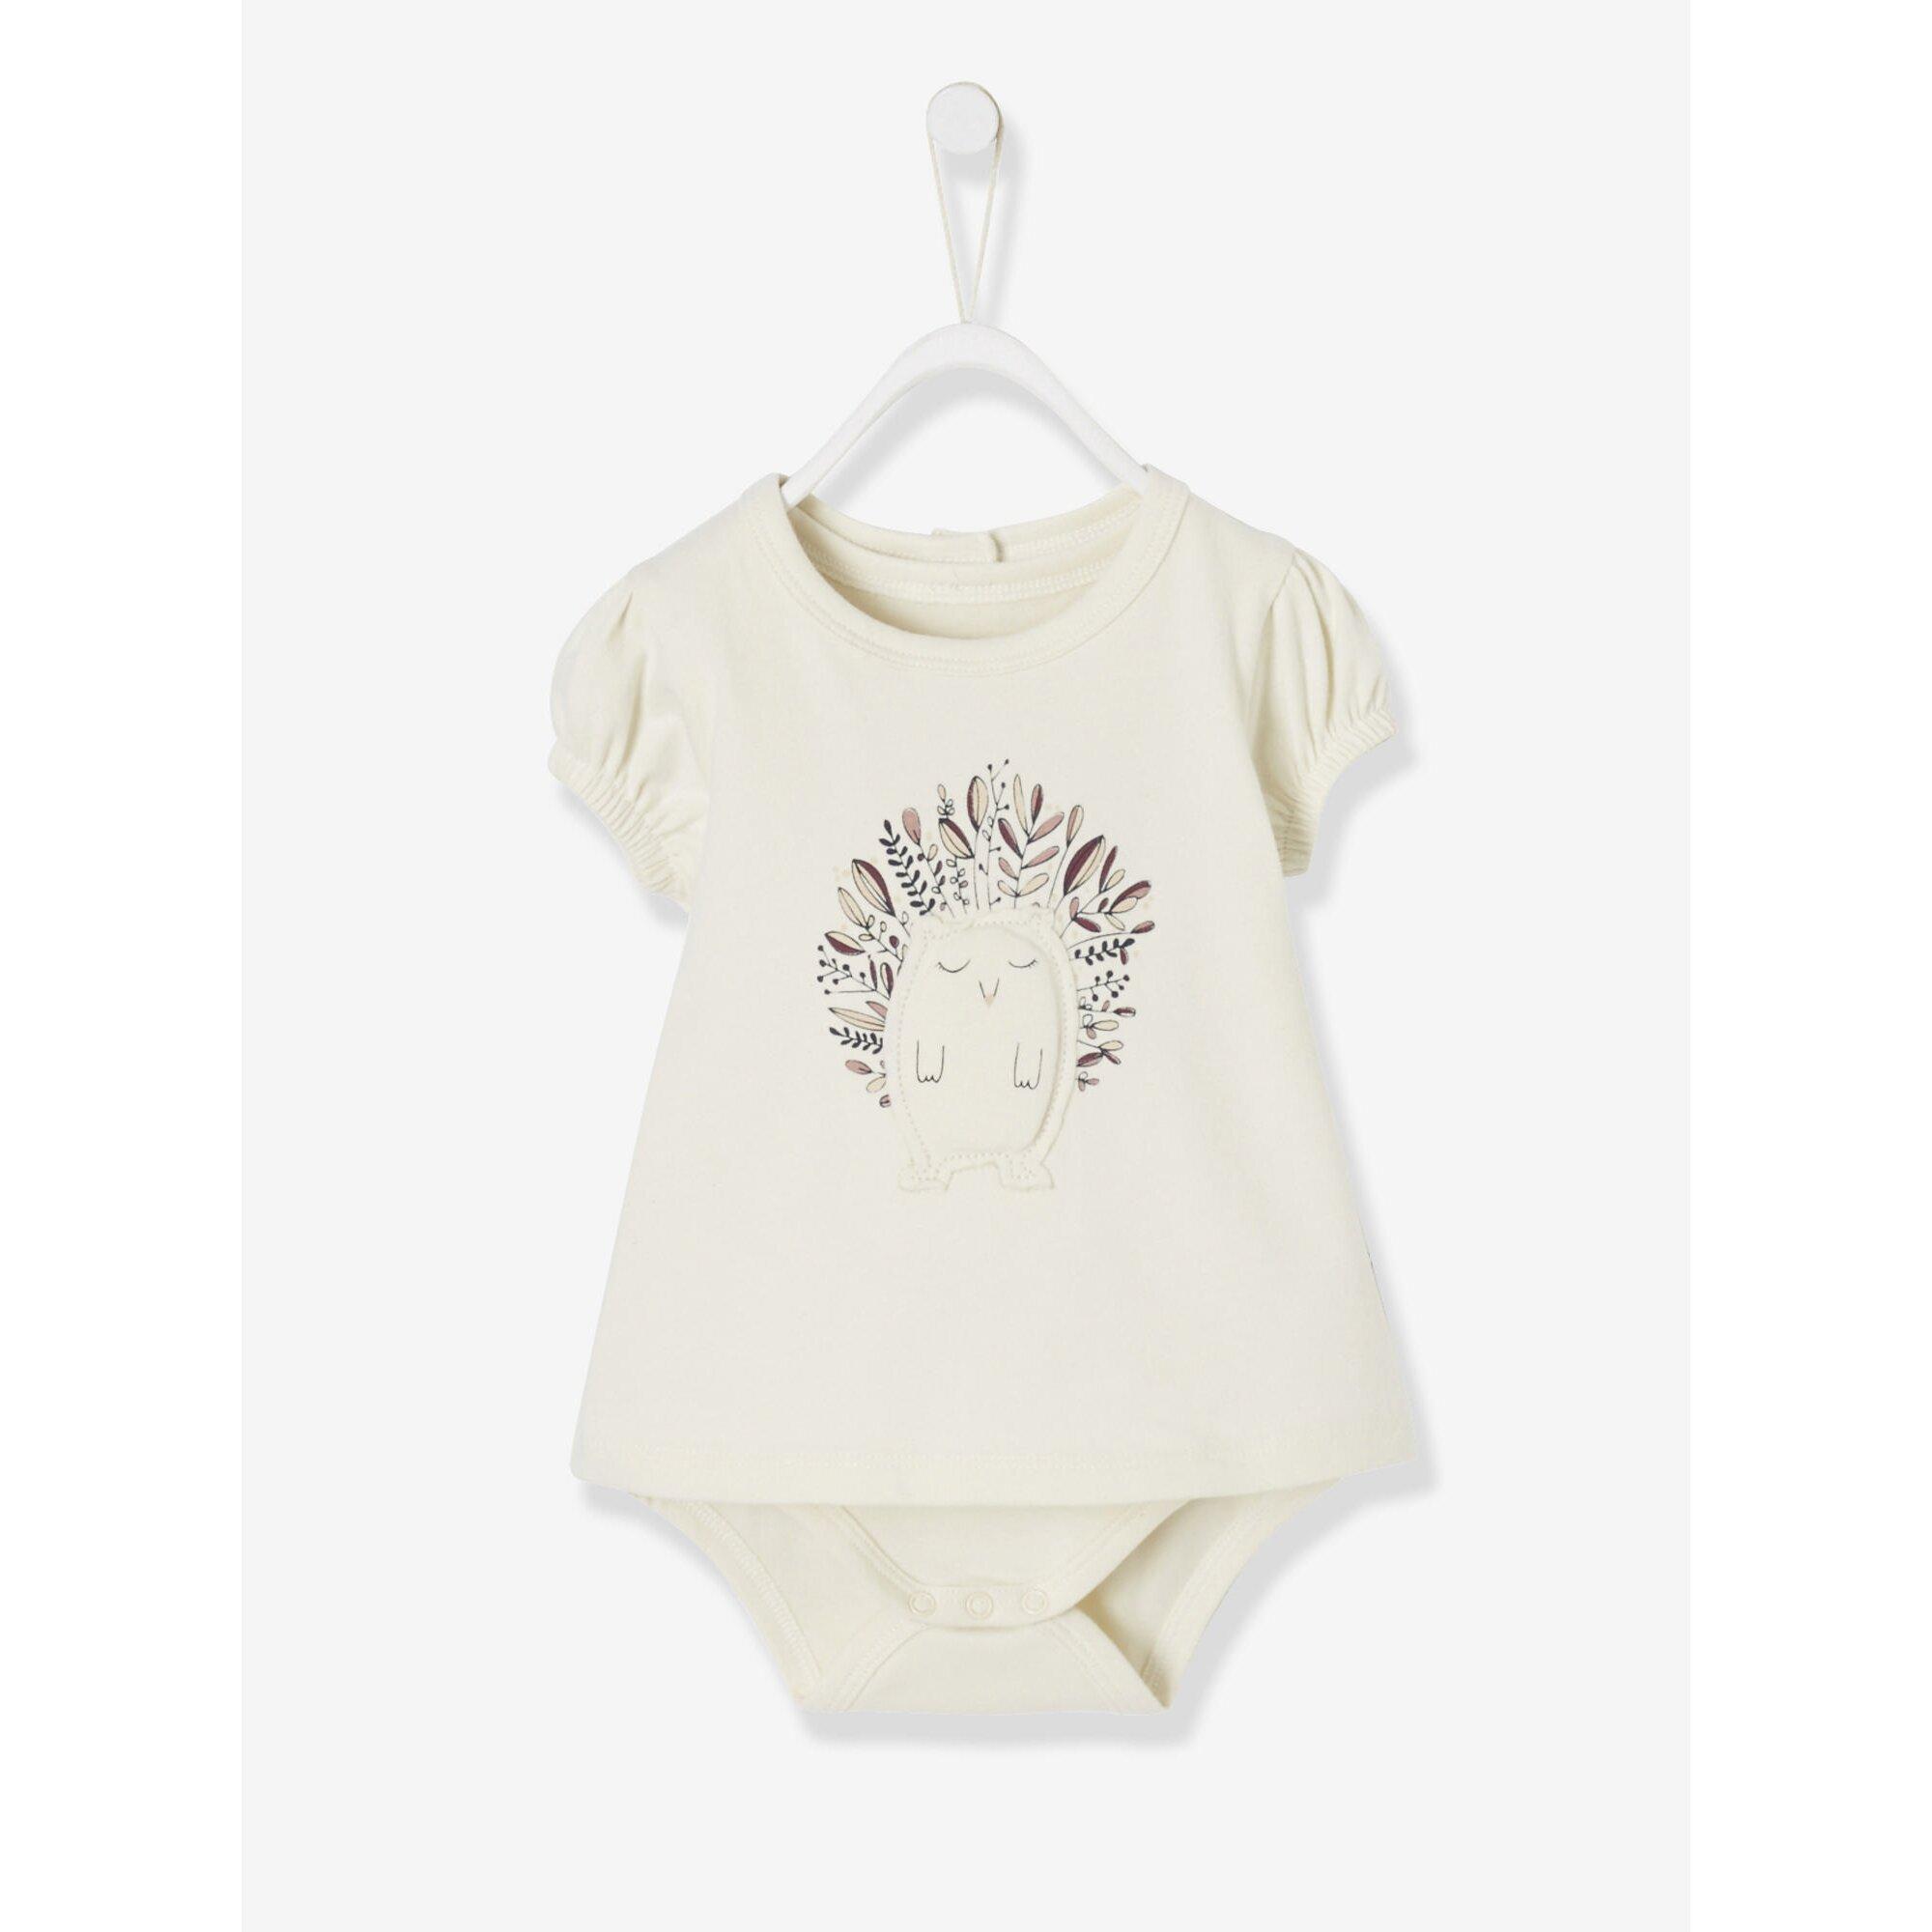 Vertbaudet Baby Mädchen Shirt-Body, Igel